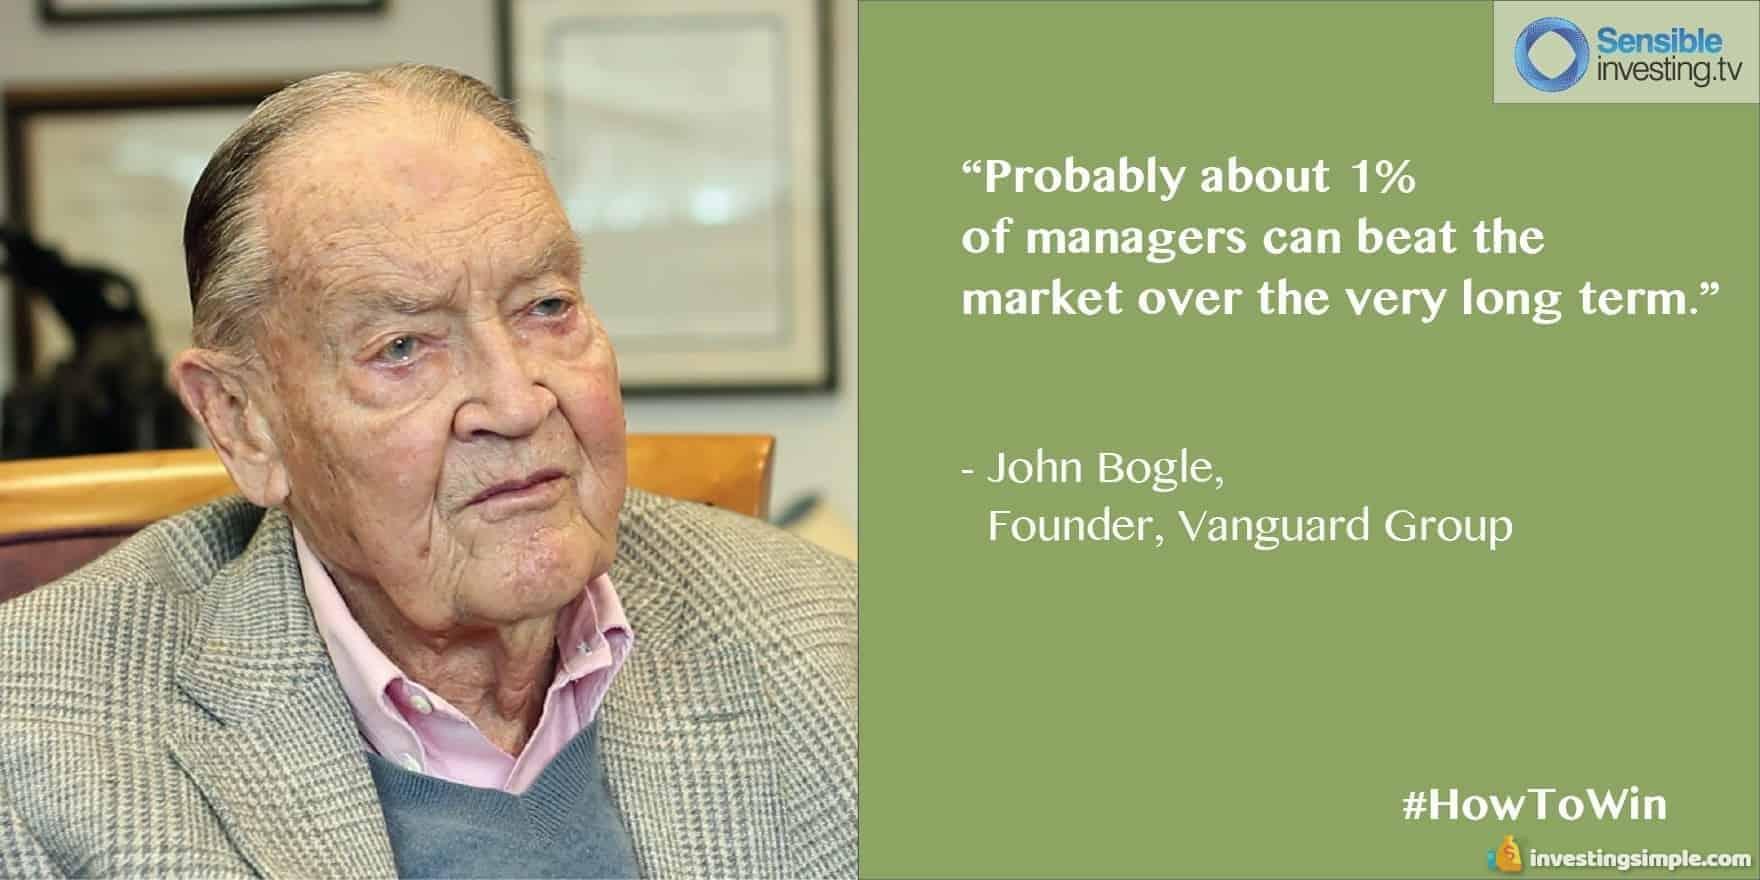 John Bogle is the founder of Vanguard.